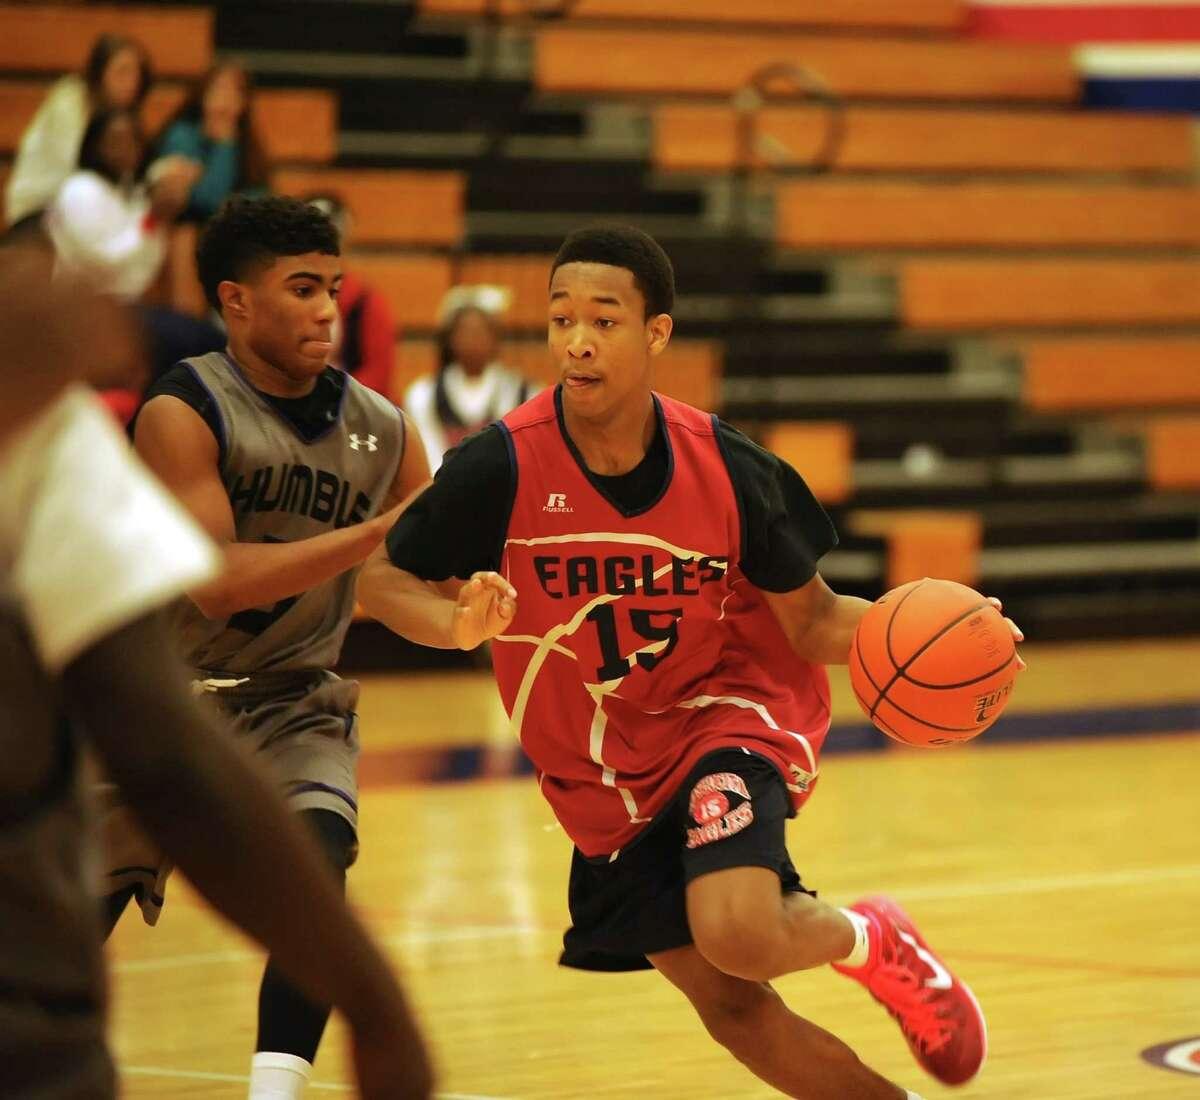 Atascocita's Alan Johnson (15) got around Humble's defense and drove to the basket to score last week.